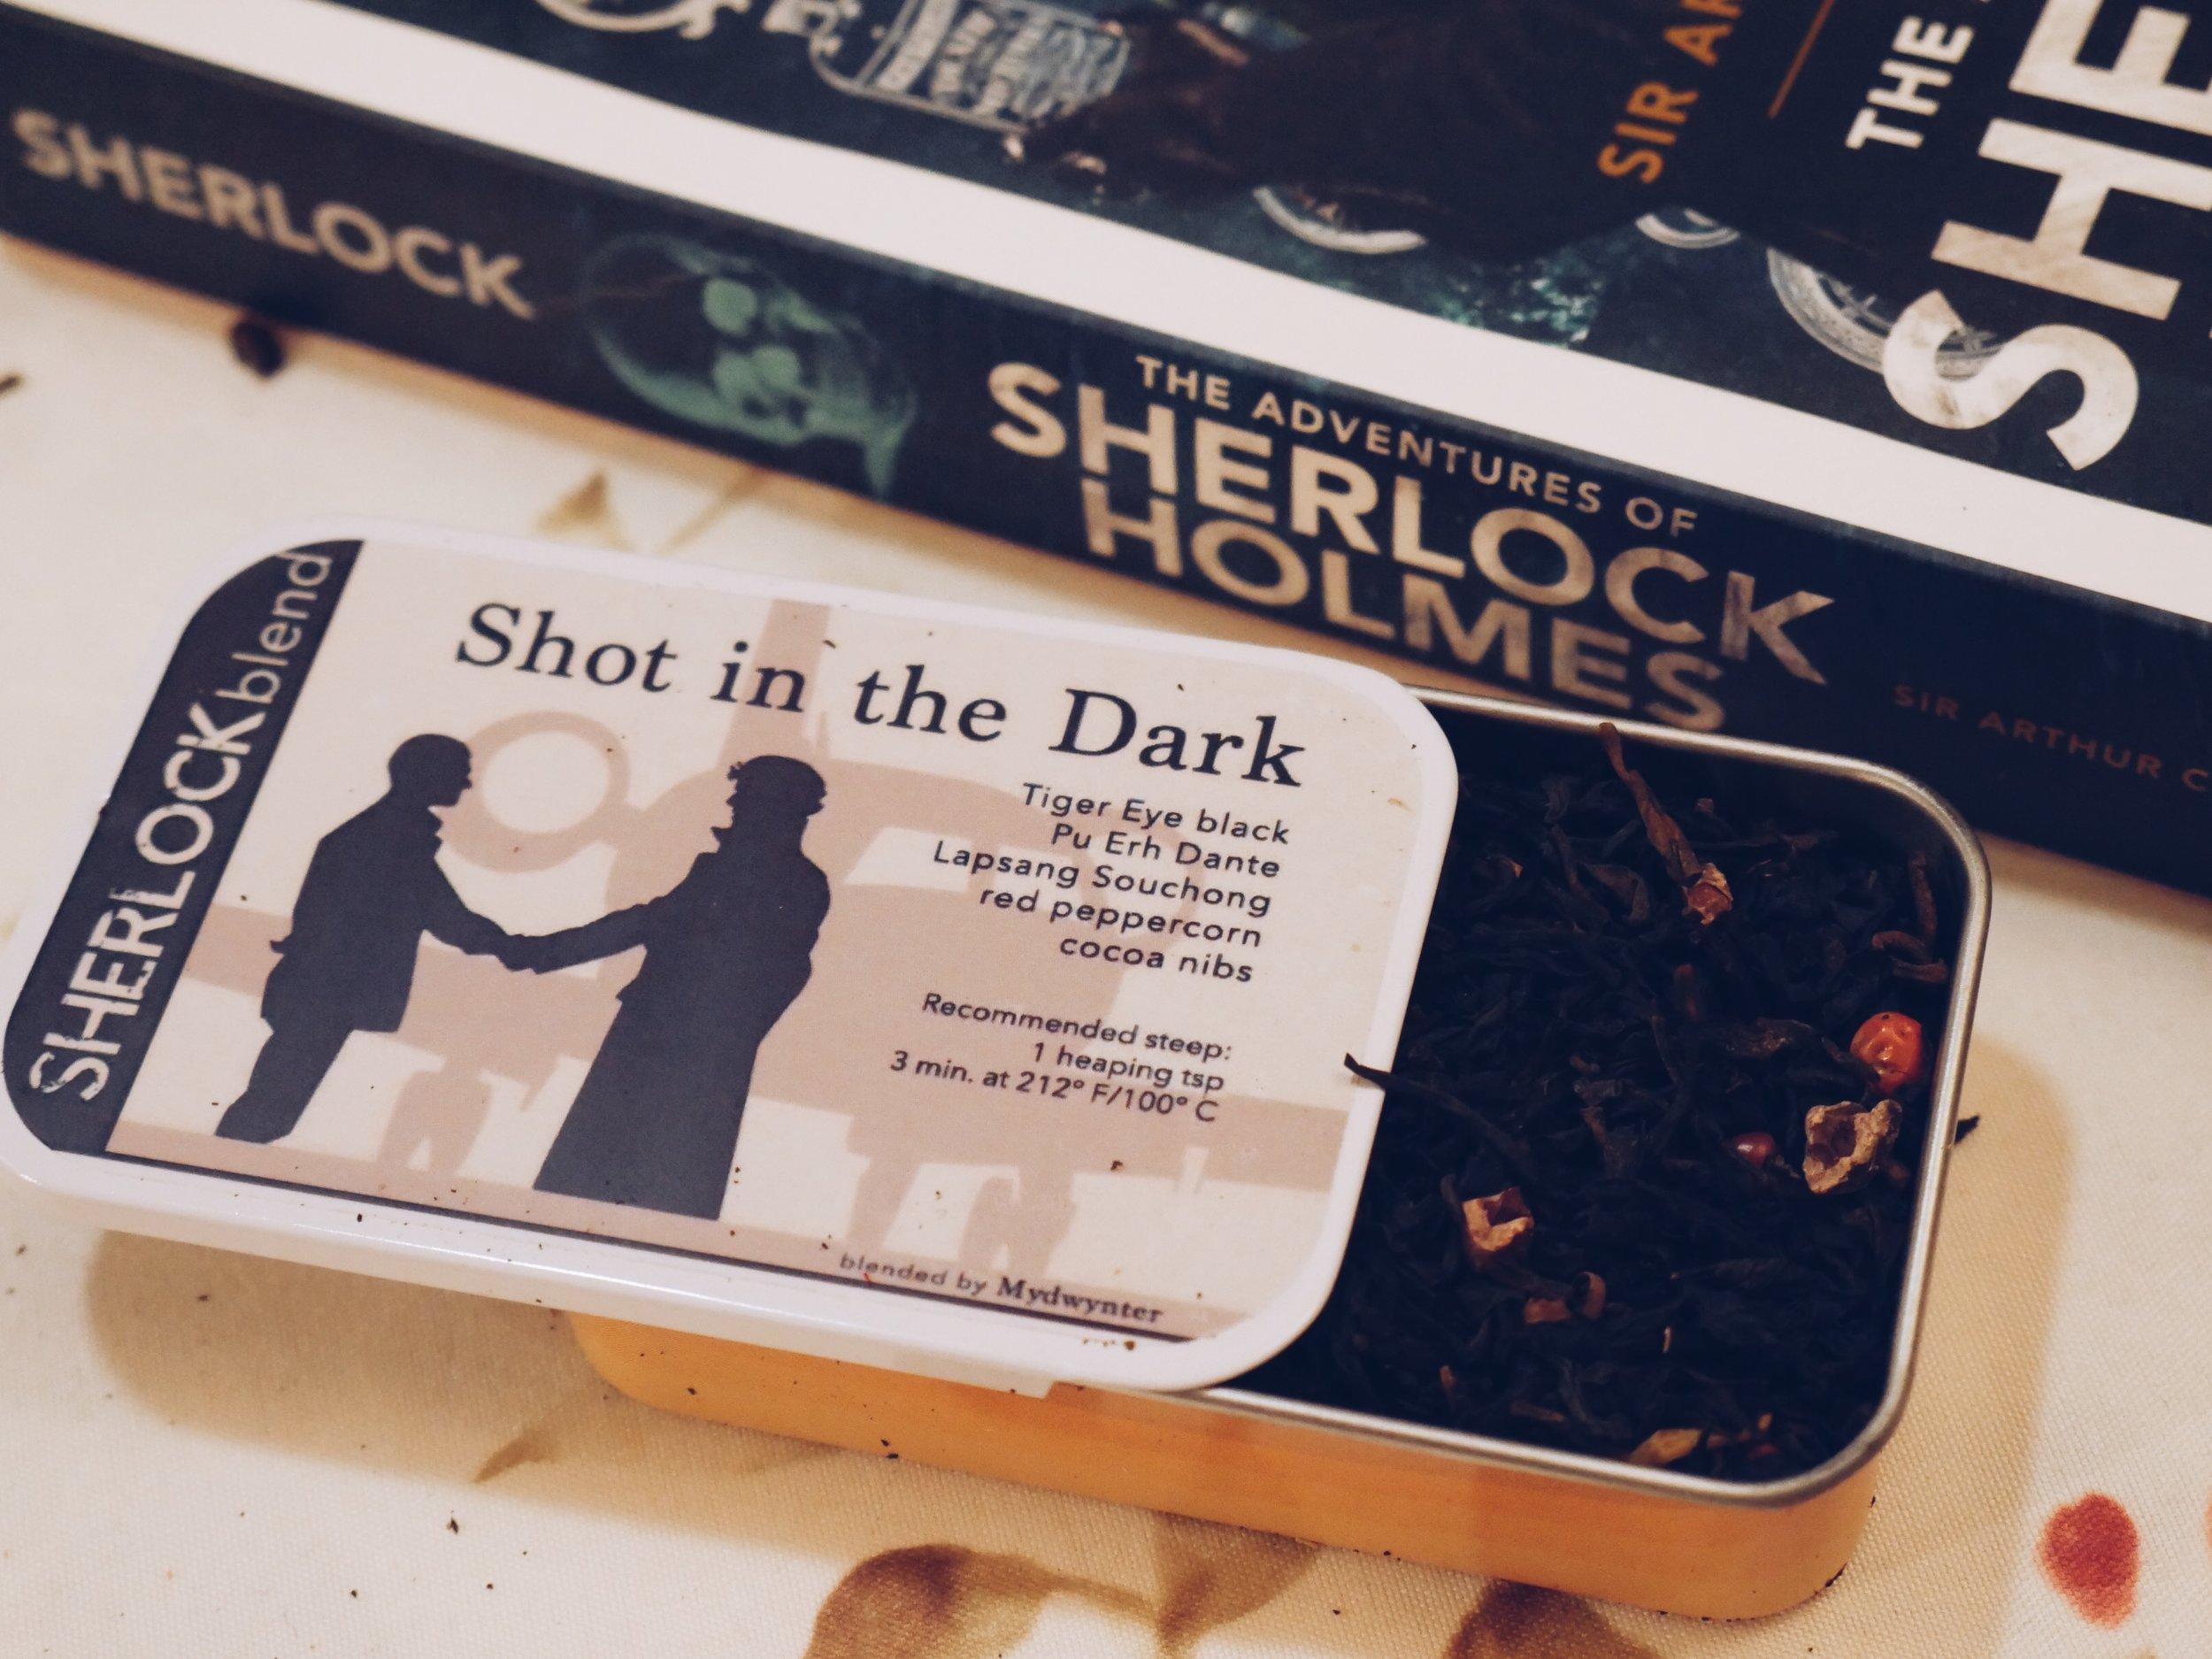 Adagio Sherlock fandom blend